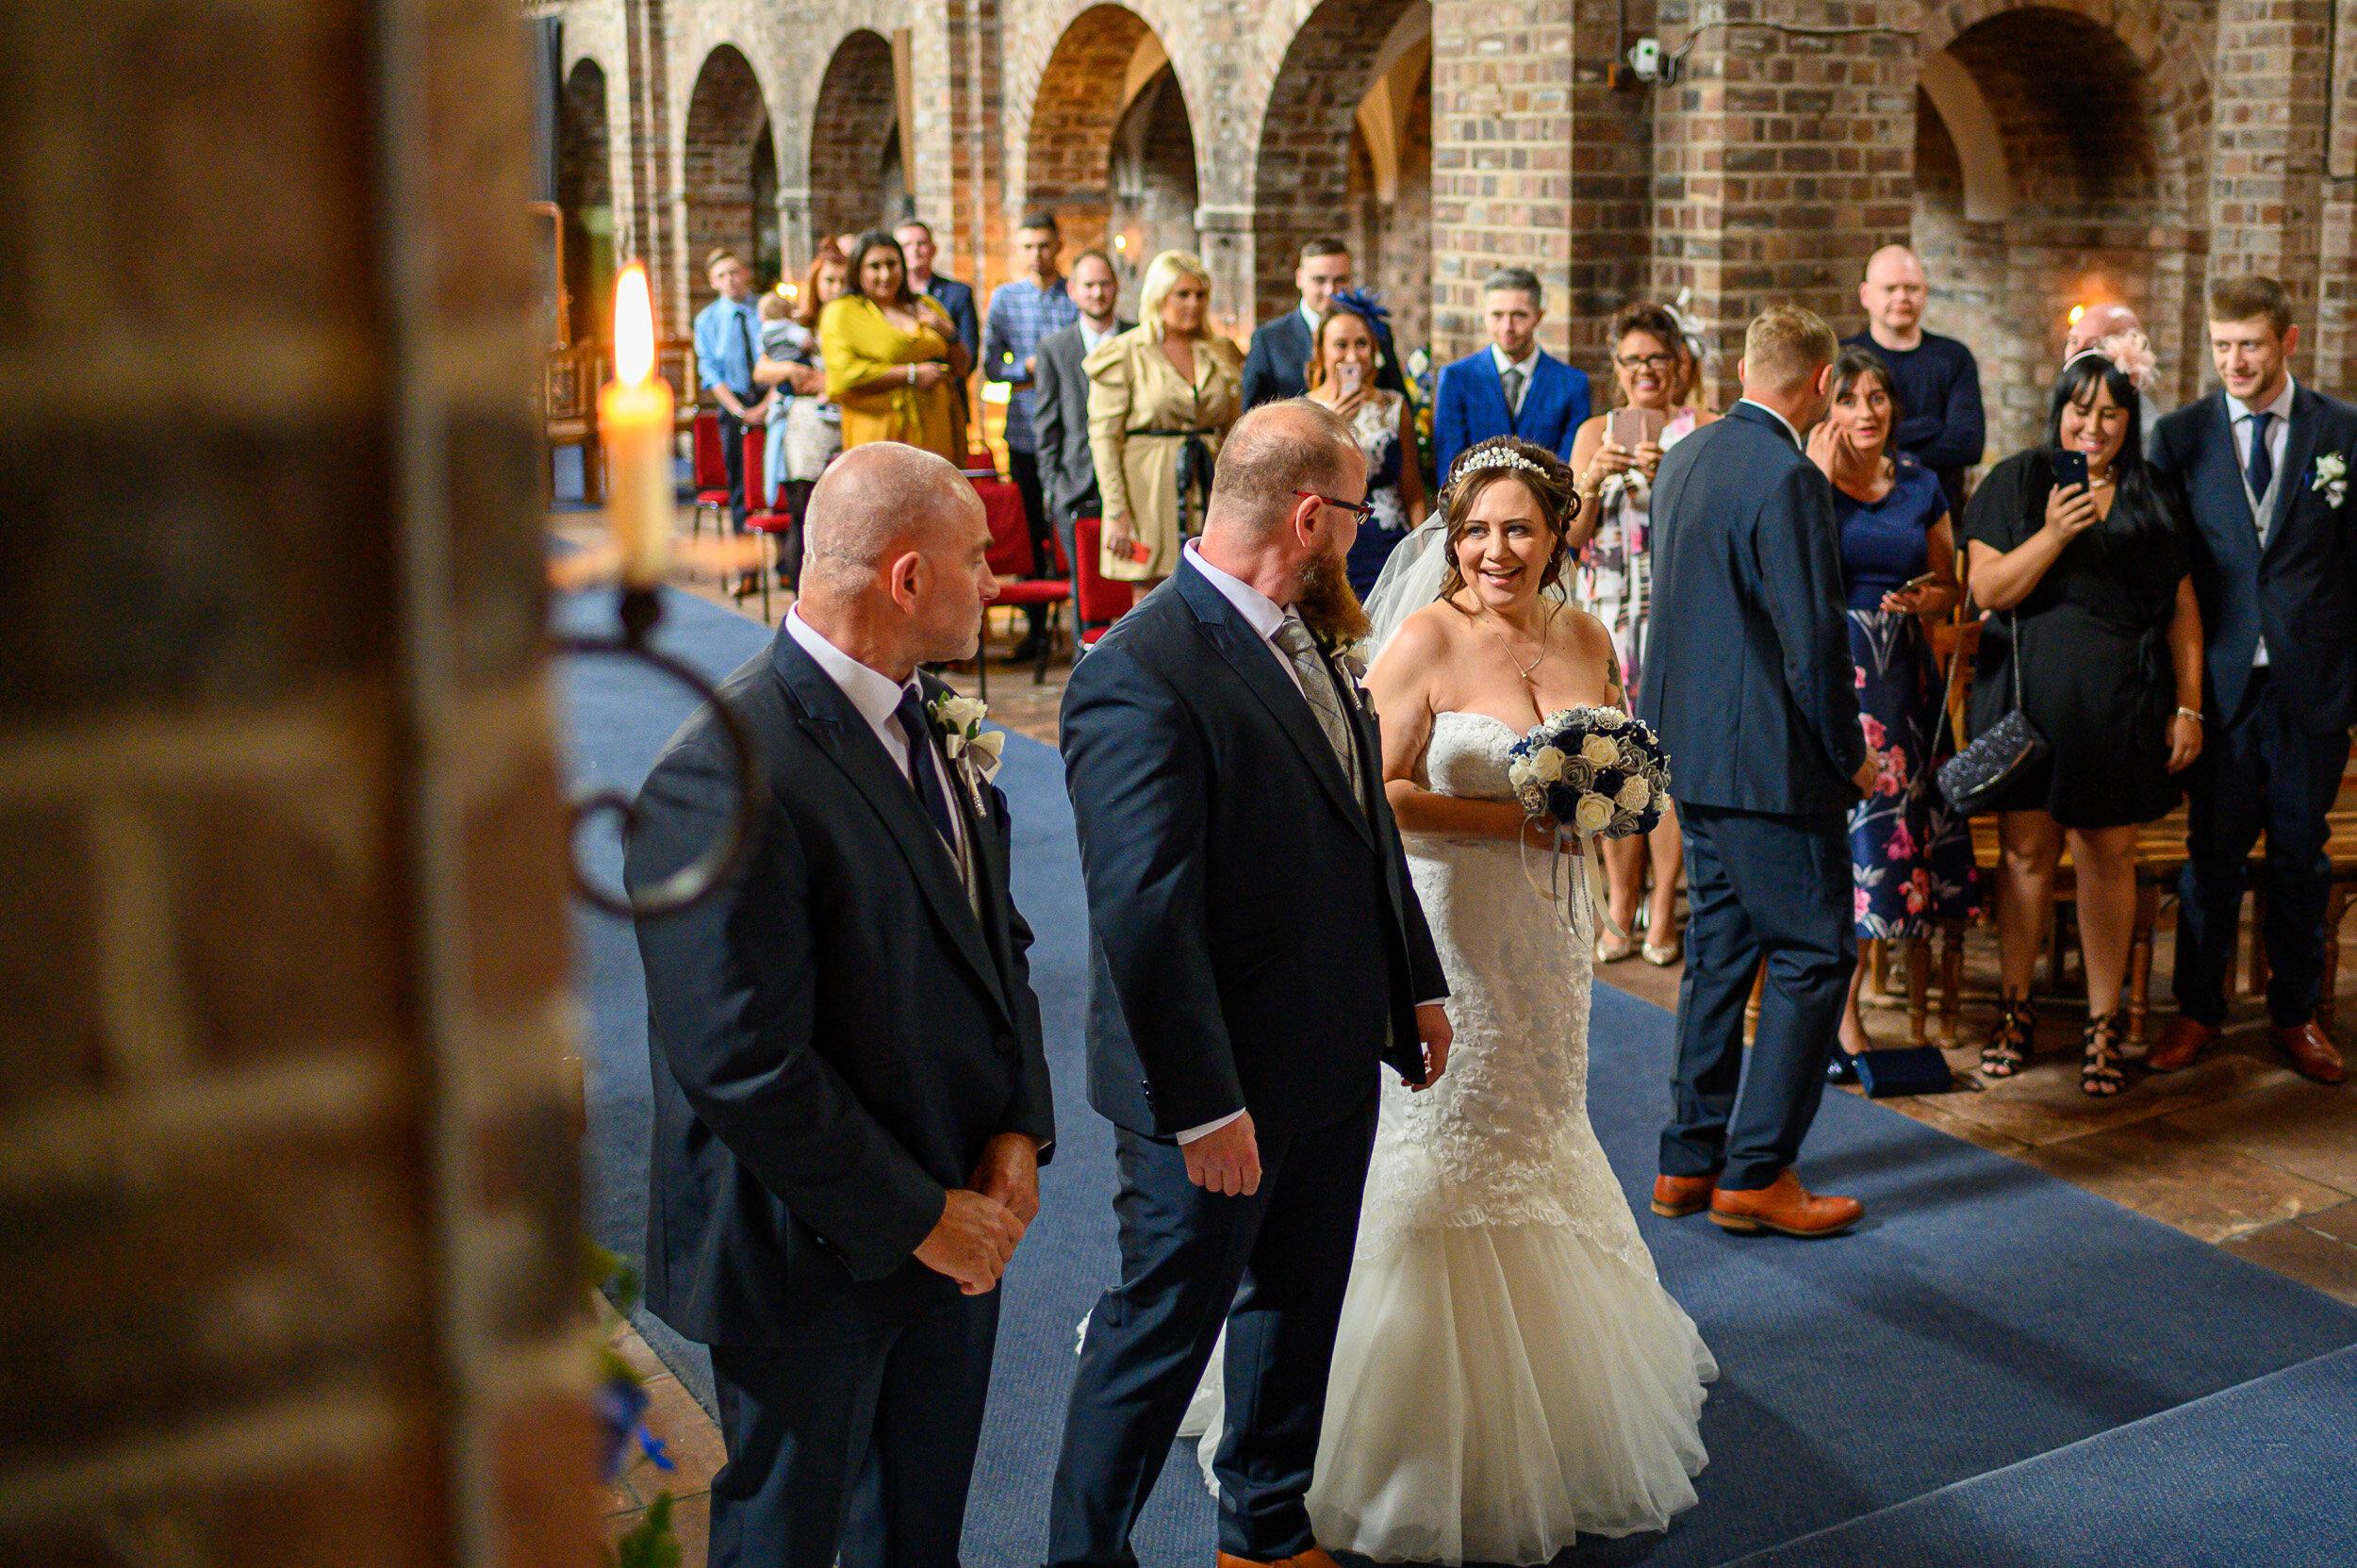 Heaton_wedding_photos_Gretna-11.jpg